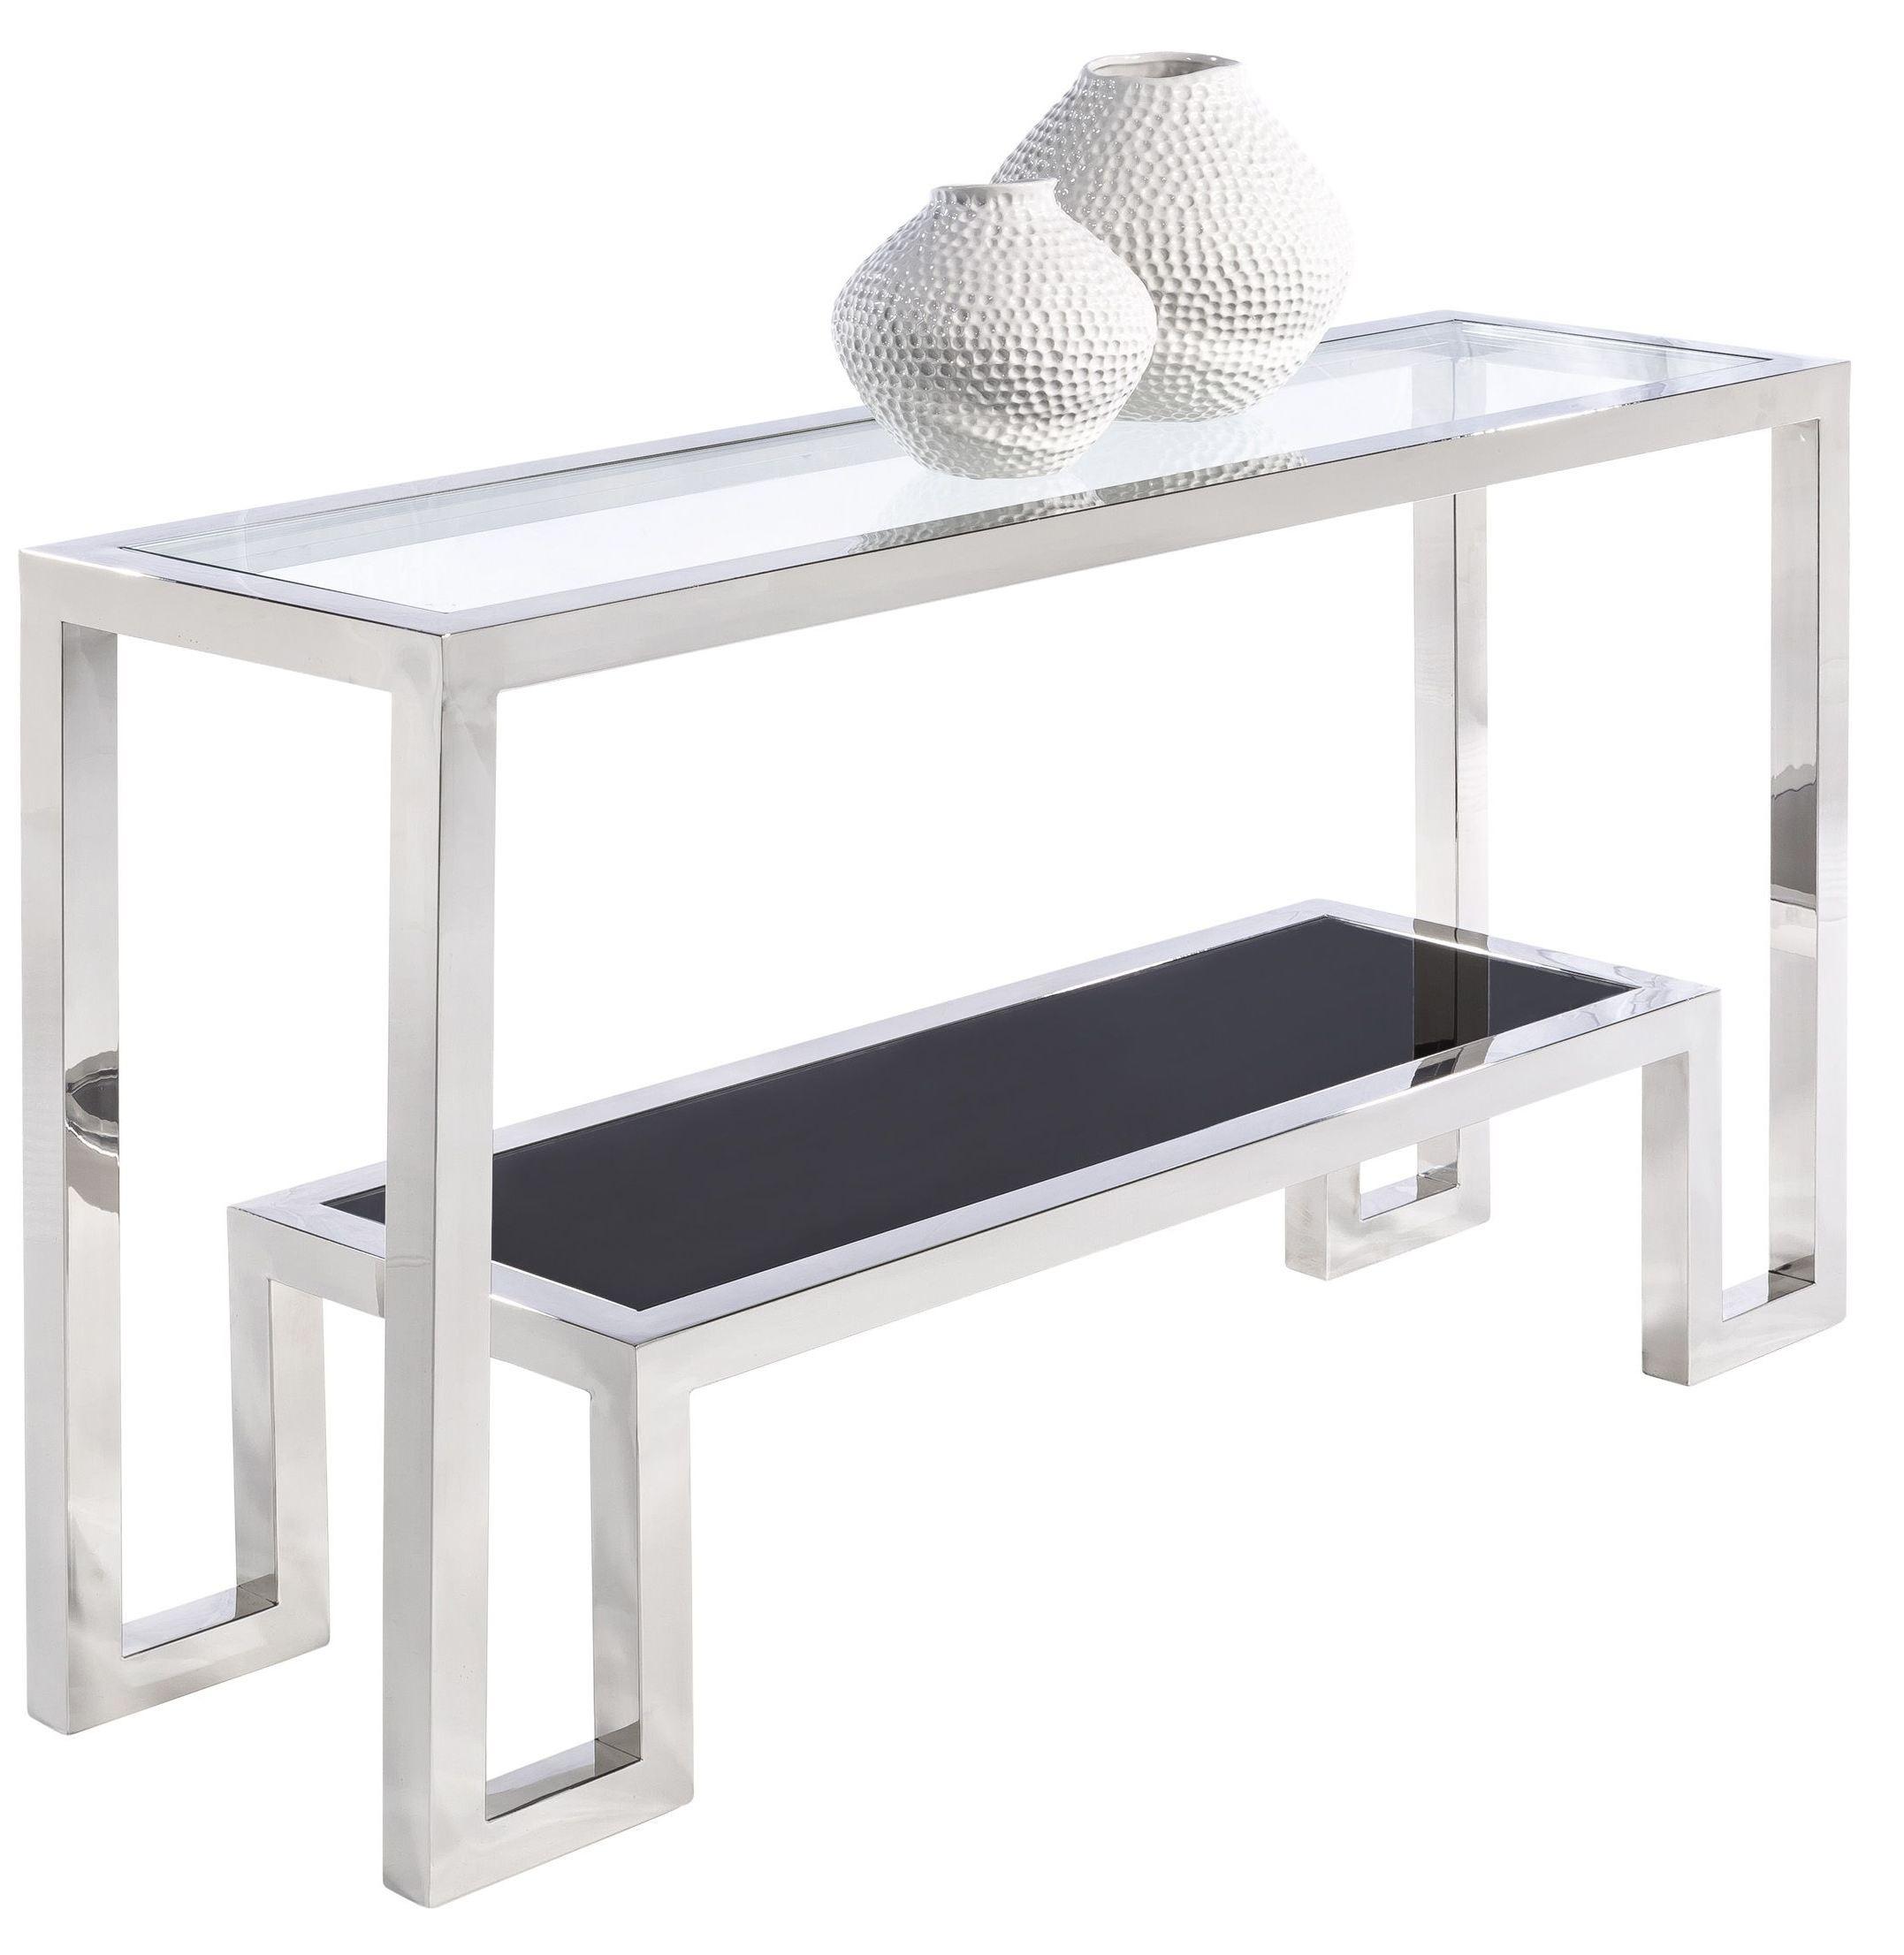 Storm glass top occasional table set 100850 sunpan for Glass top occasional tables